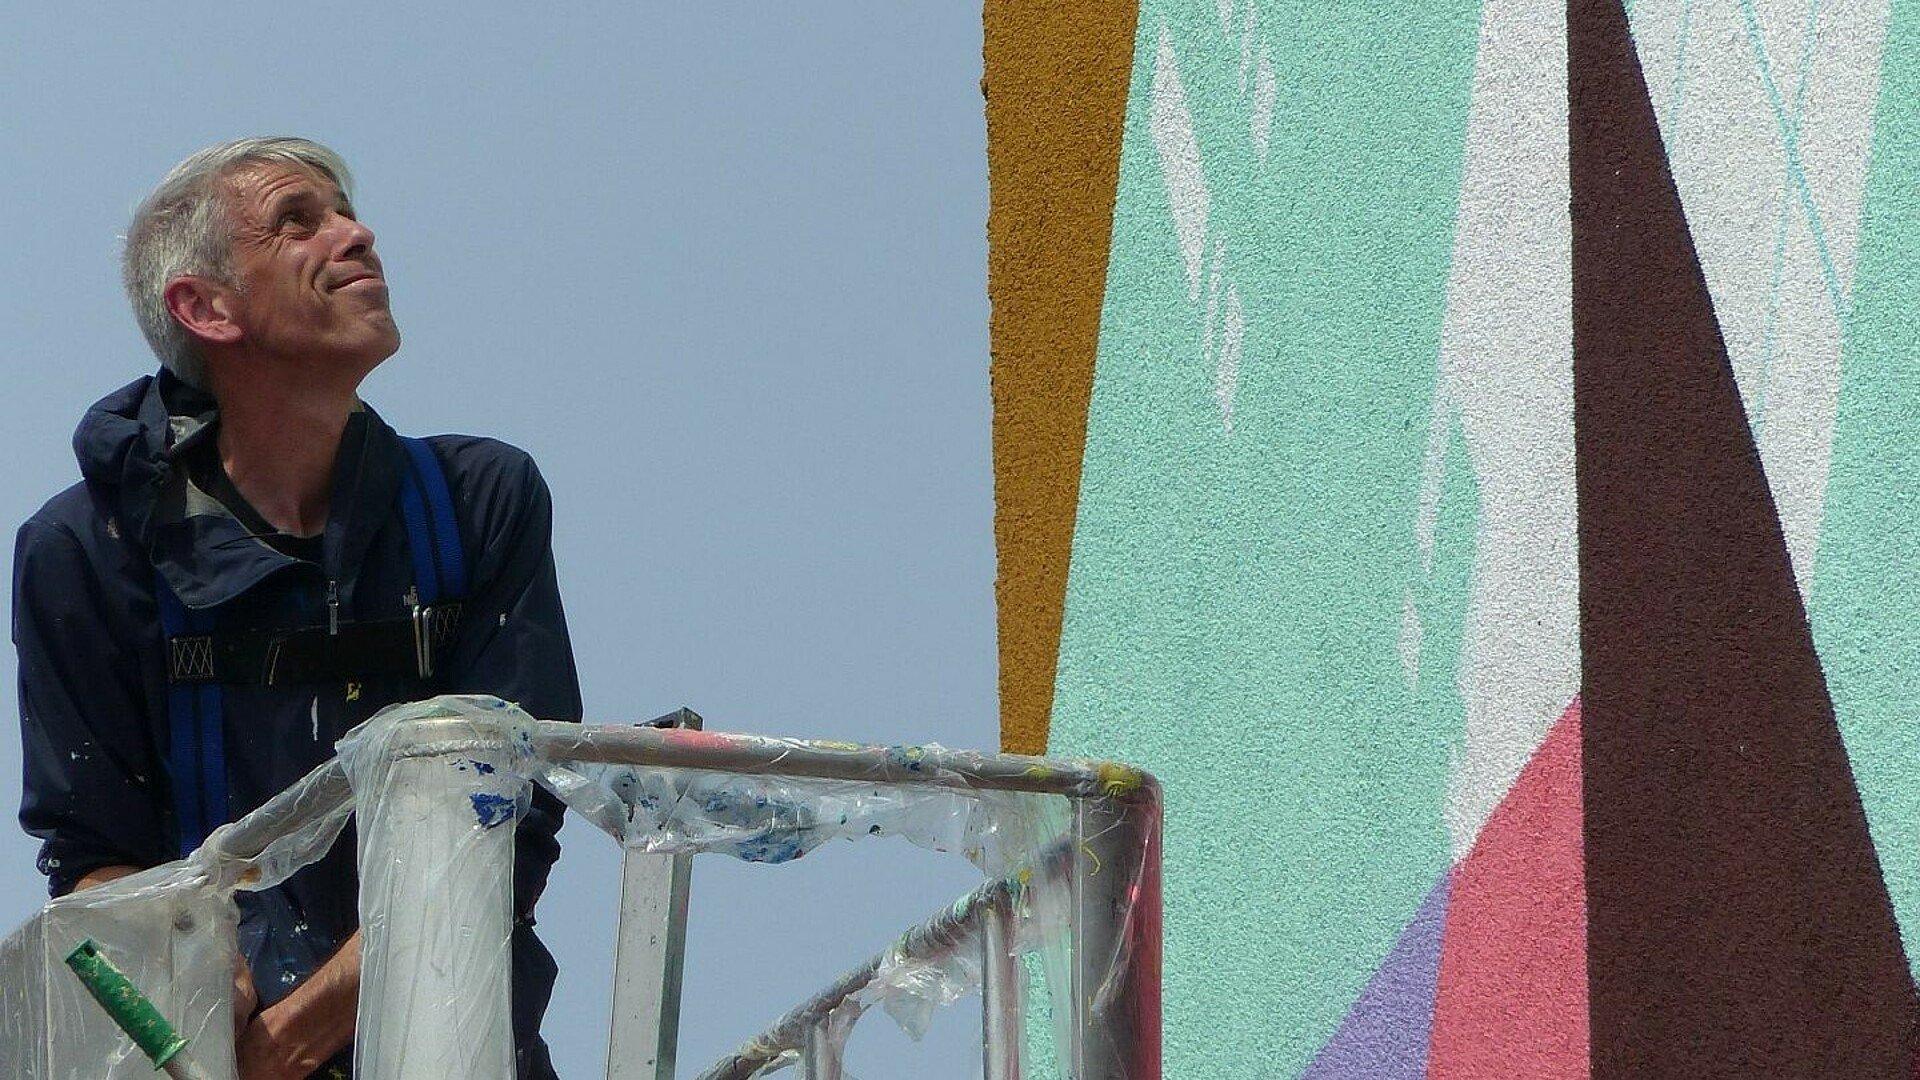 Zedz vor seinem Mural in Ehrenfeld